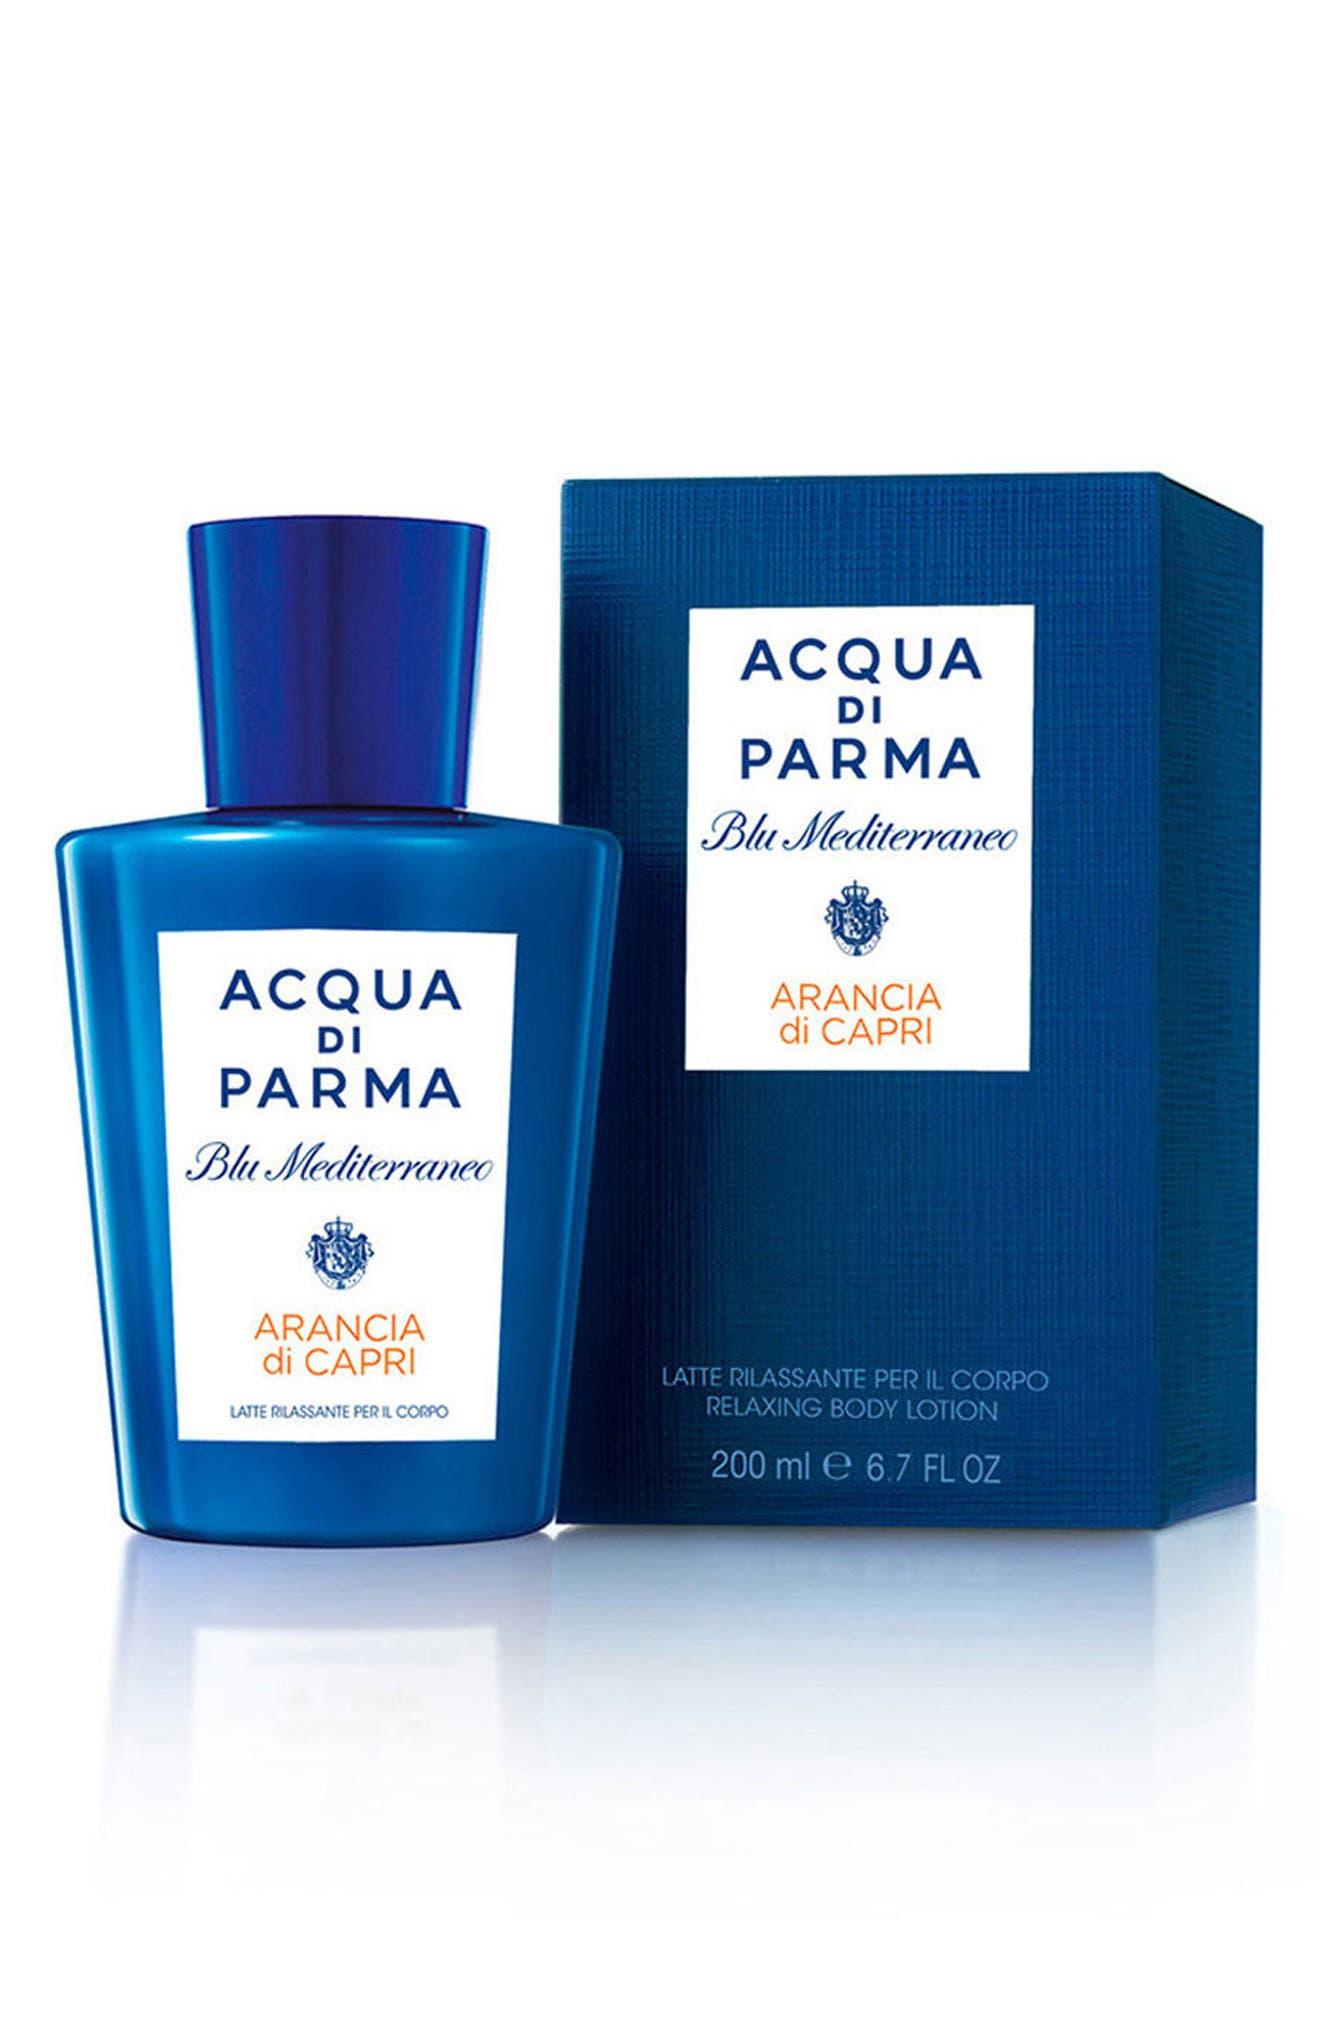 Alternate Image 2  - Acqua di Parma 'Blu Mediterraneo' Arancia di Capri Body Lotion